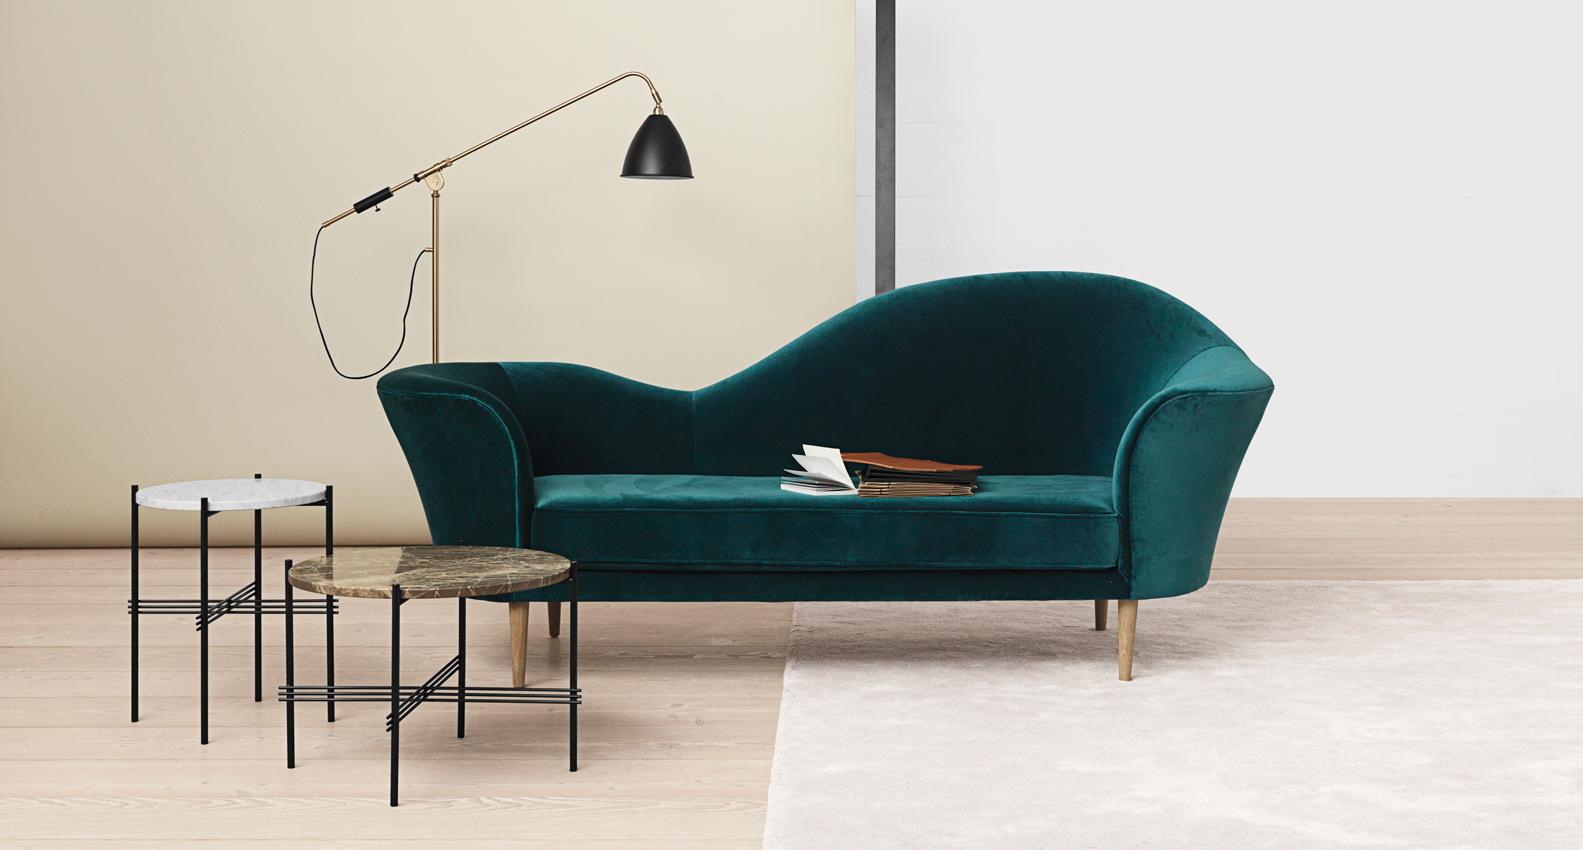 Grand-piano-sofa-petroleum-velvet_Bestlite-BL4-floor-lamp-charcoal-black_brass_TS-table-white-and-brown-marble